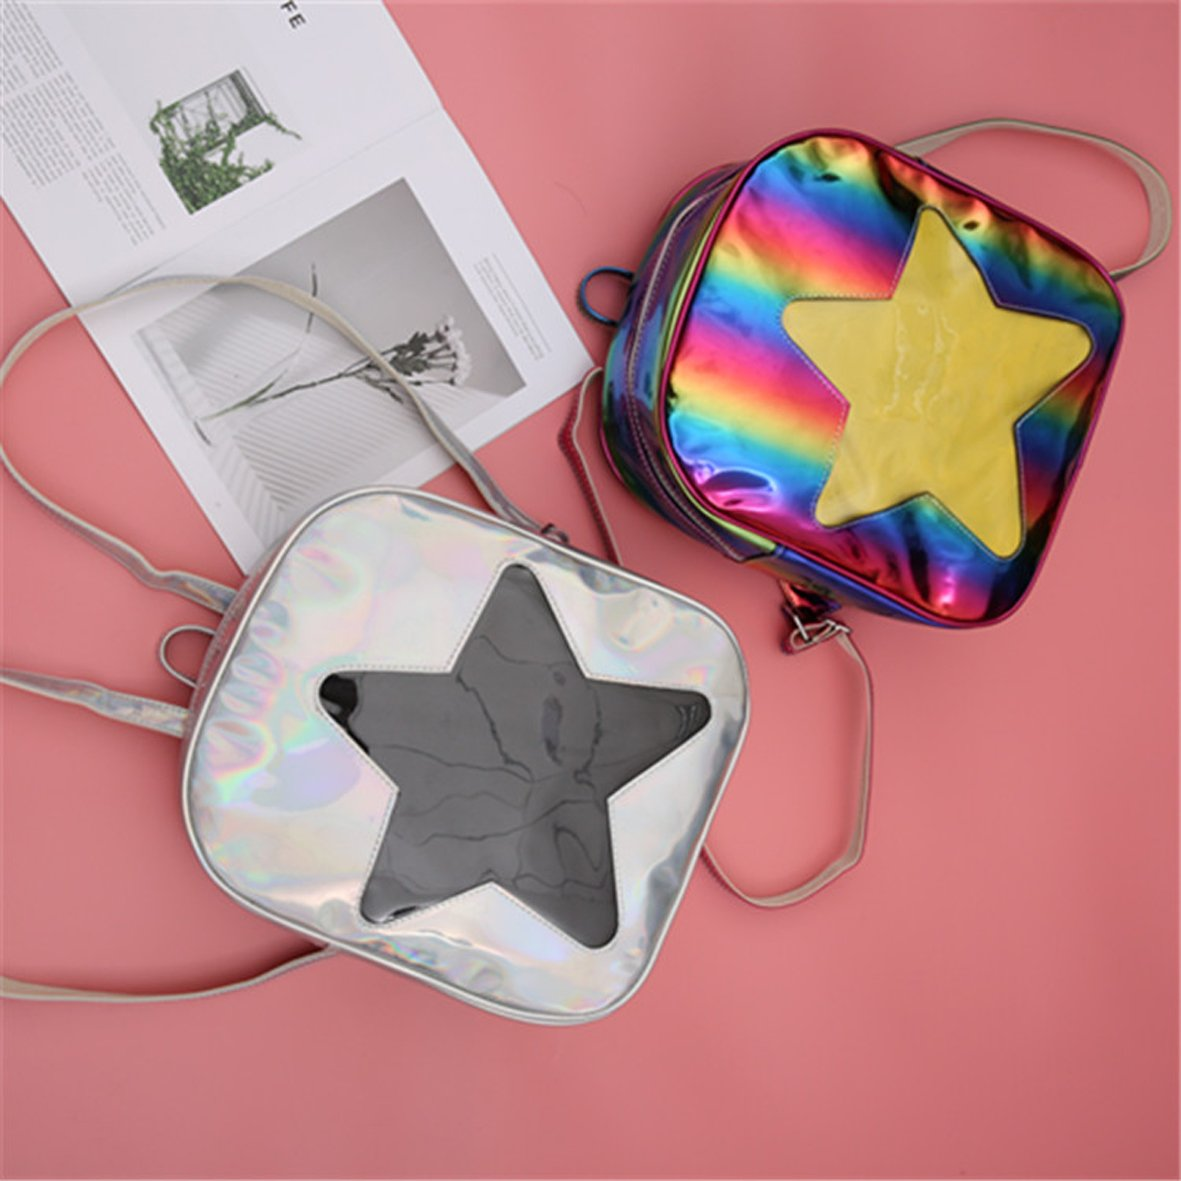 Girls Kawaii Bling Transparent Love Star School Bag Backpack (Star-Silver) by XSCOMSPORT (Image #4)